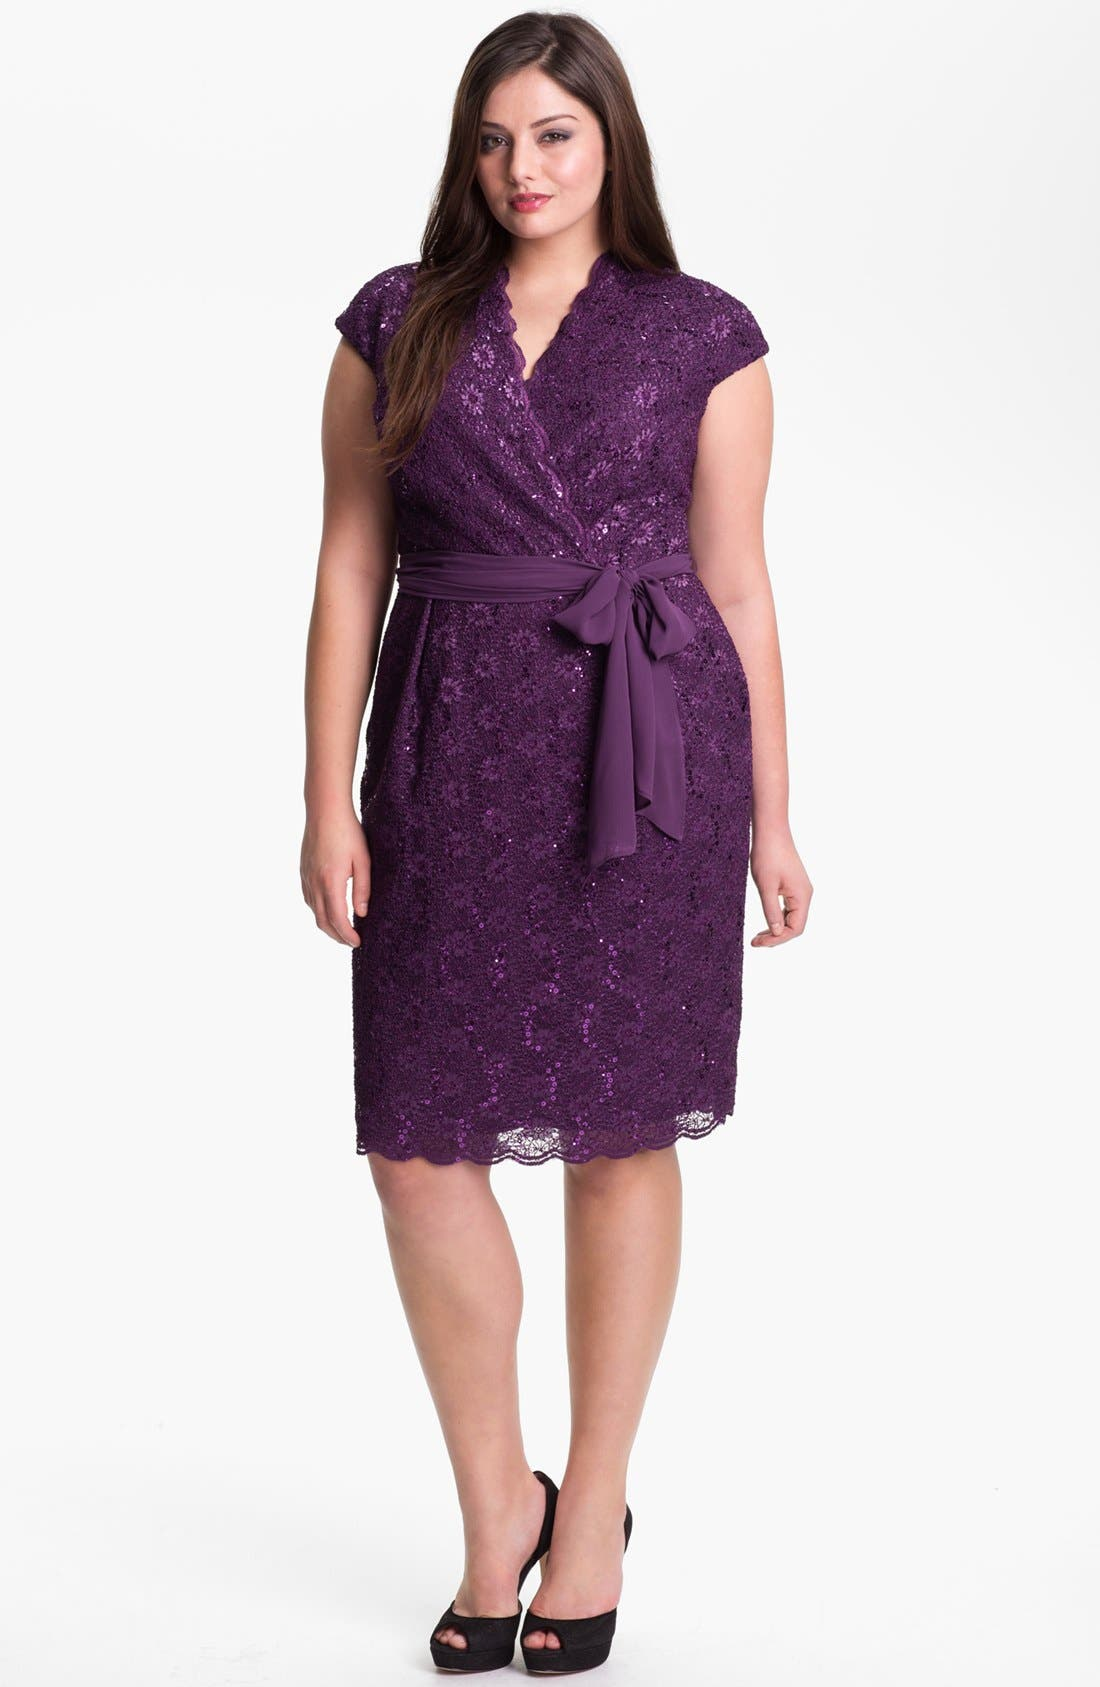 Alternate Image 1 Selected - Alex Evenings Surplice Lace Dress (Plus Size)